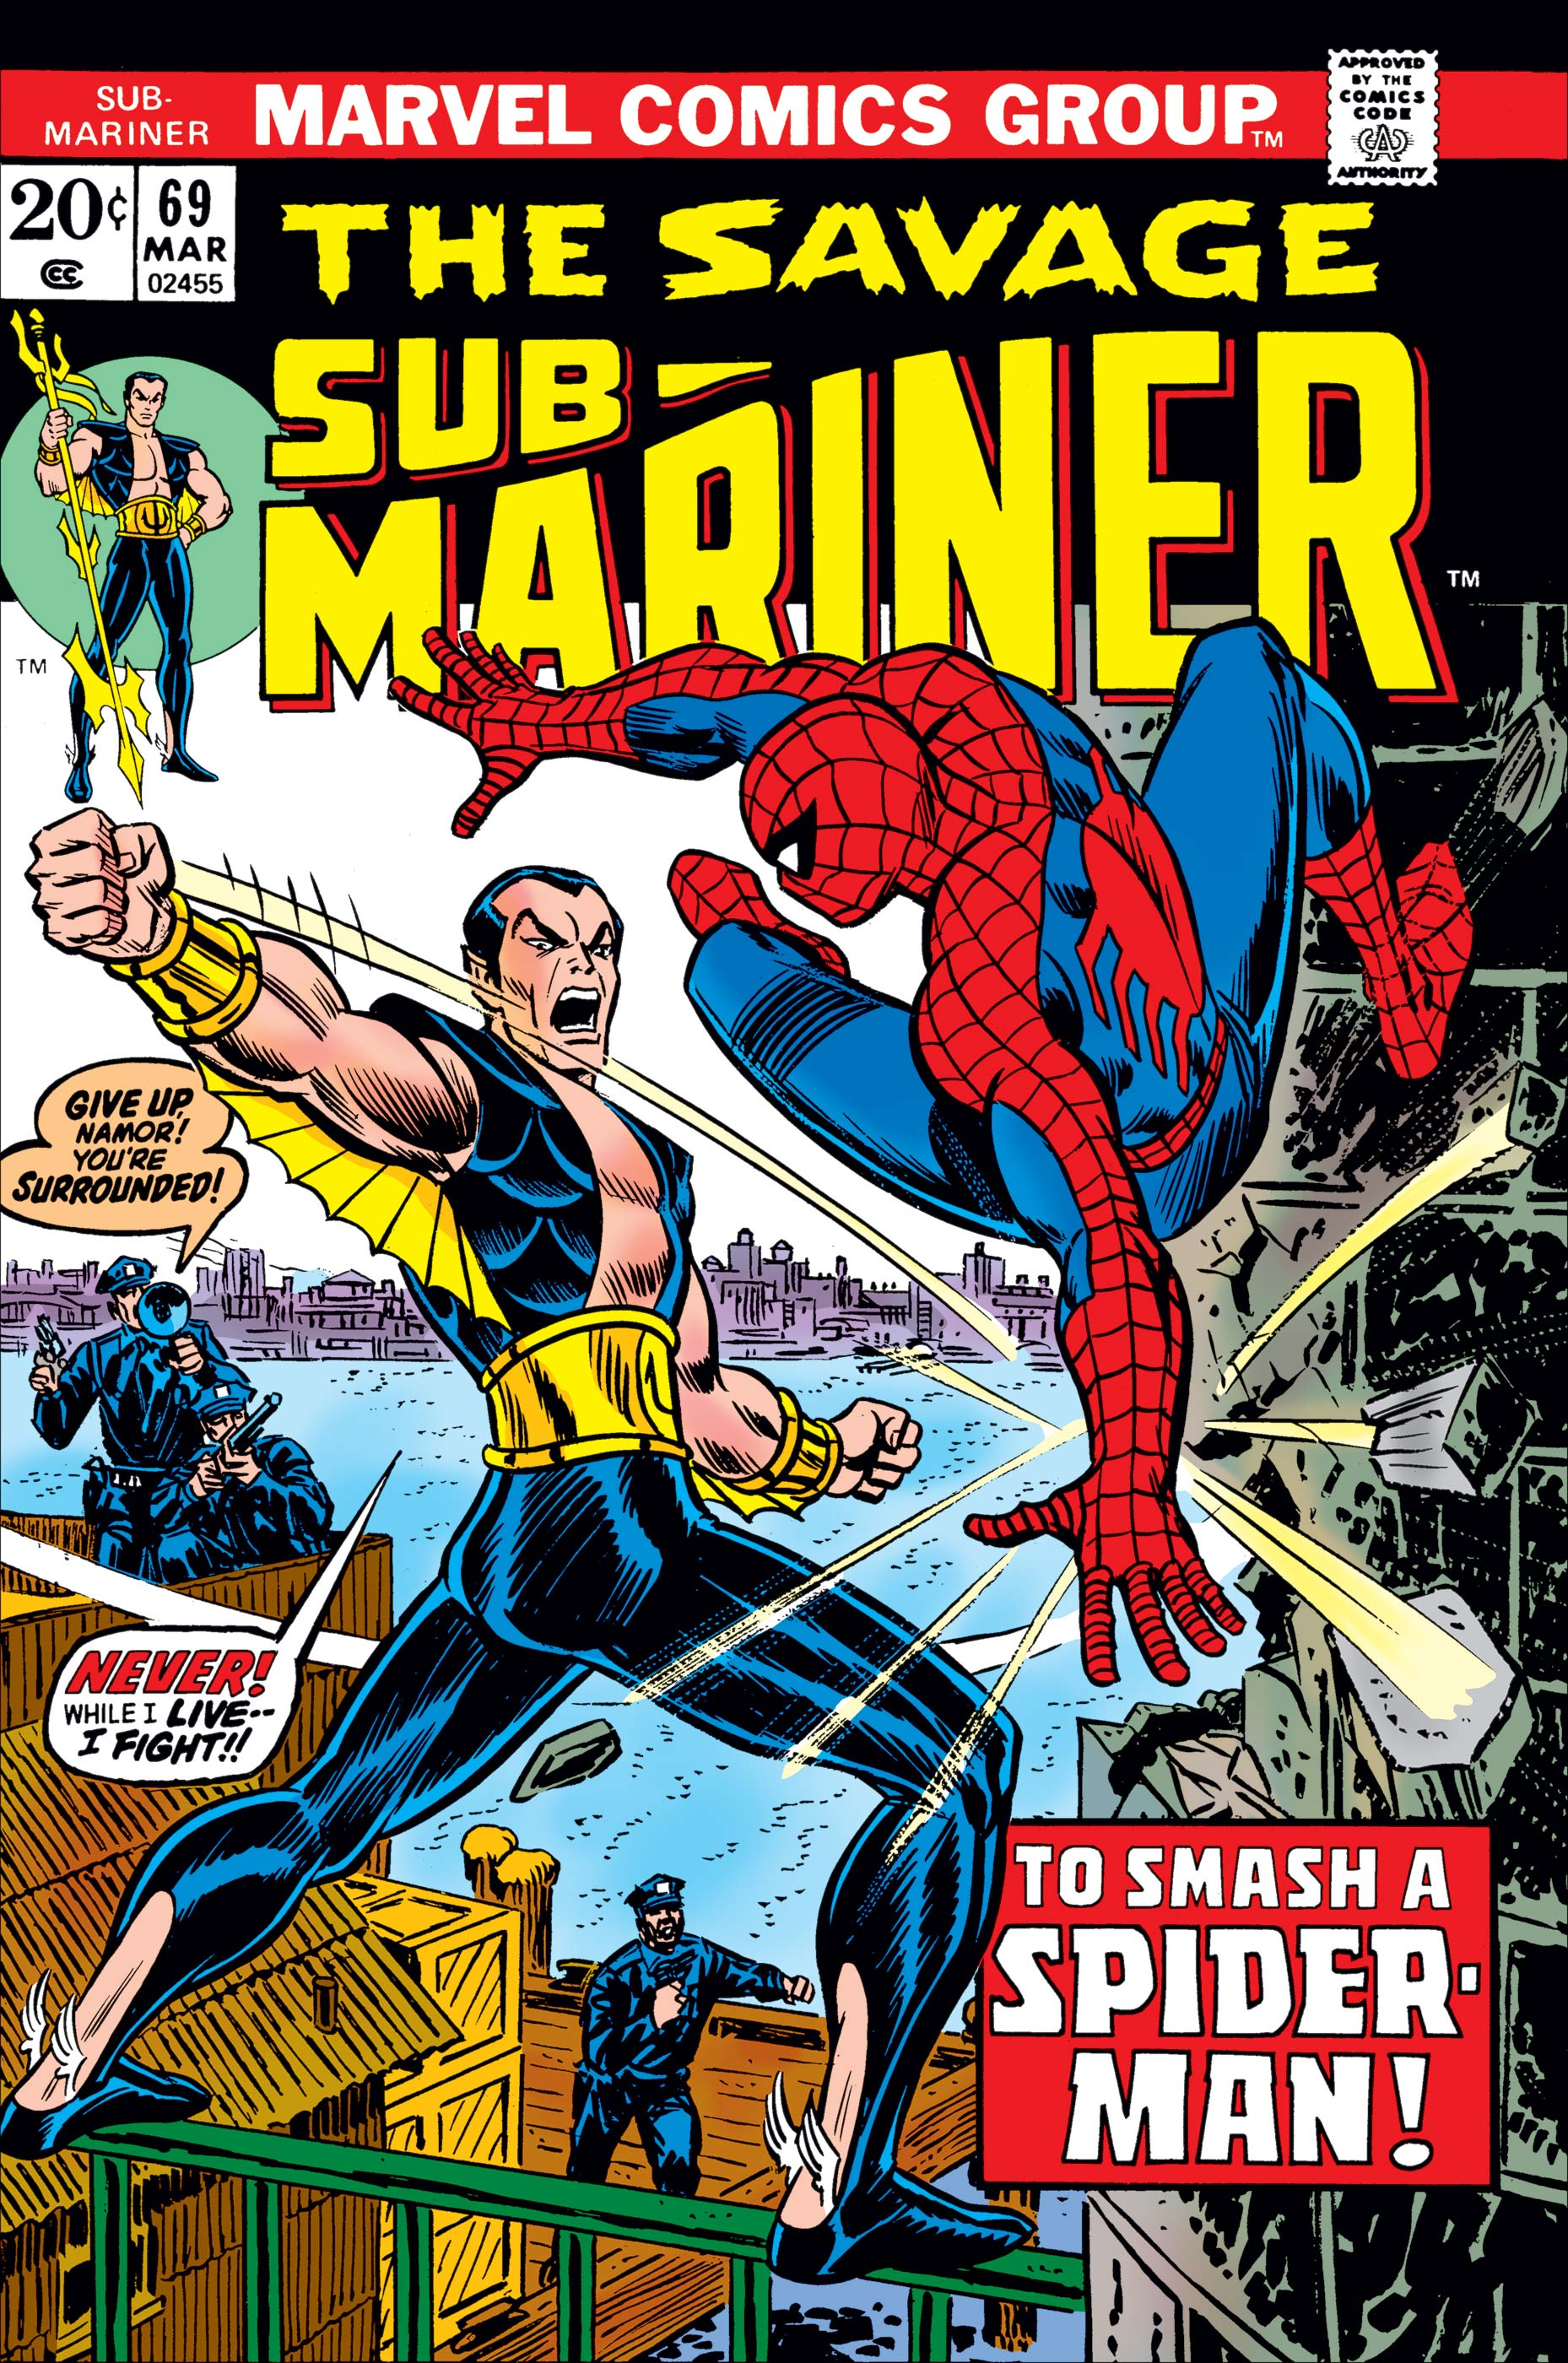 Sub-Mariner (1968) #69